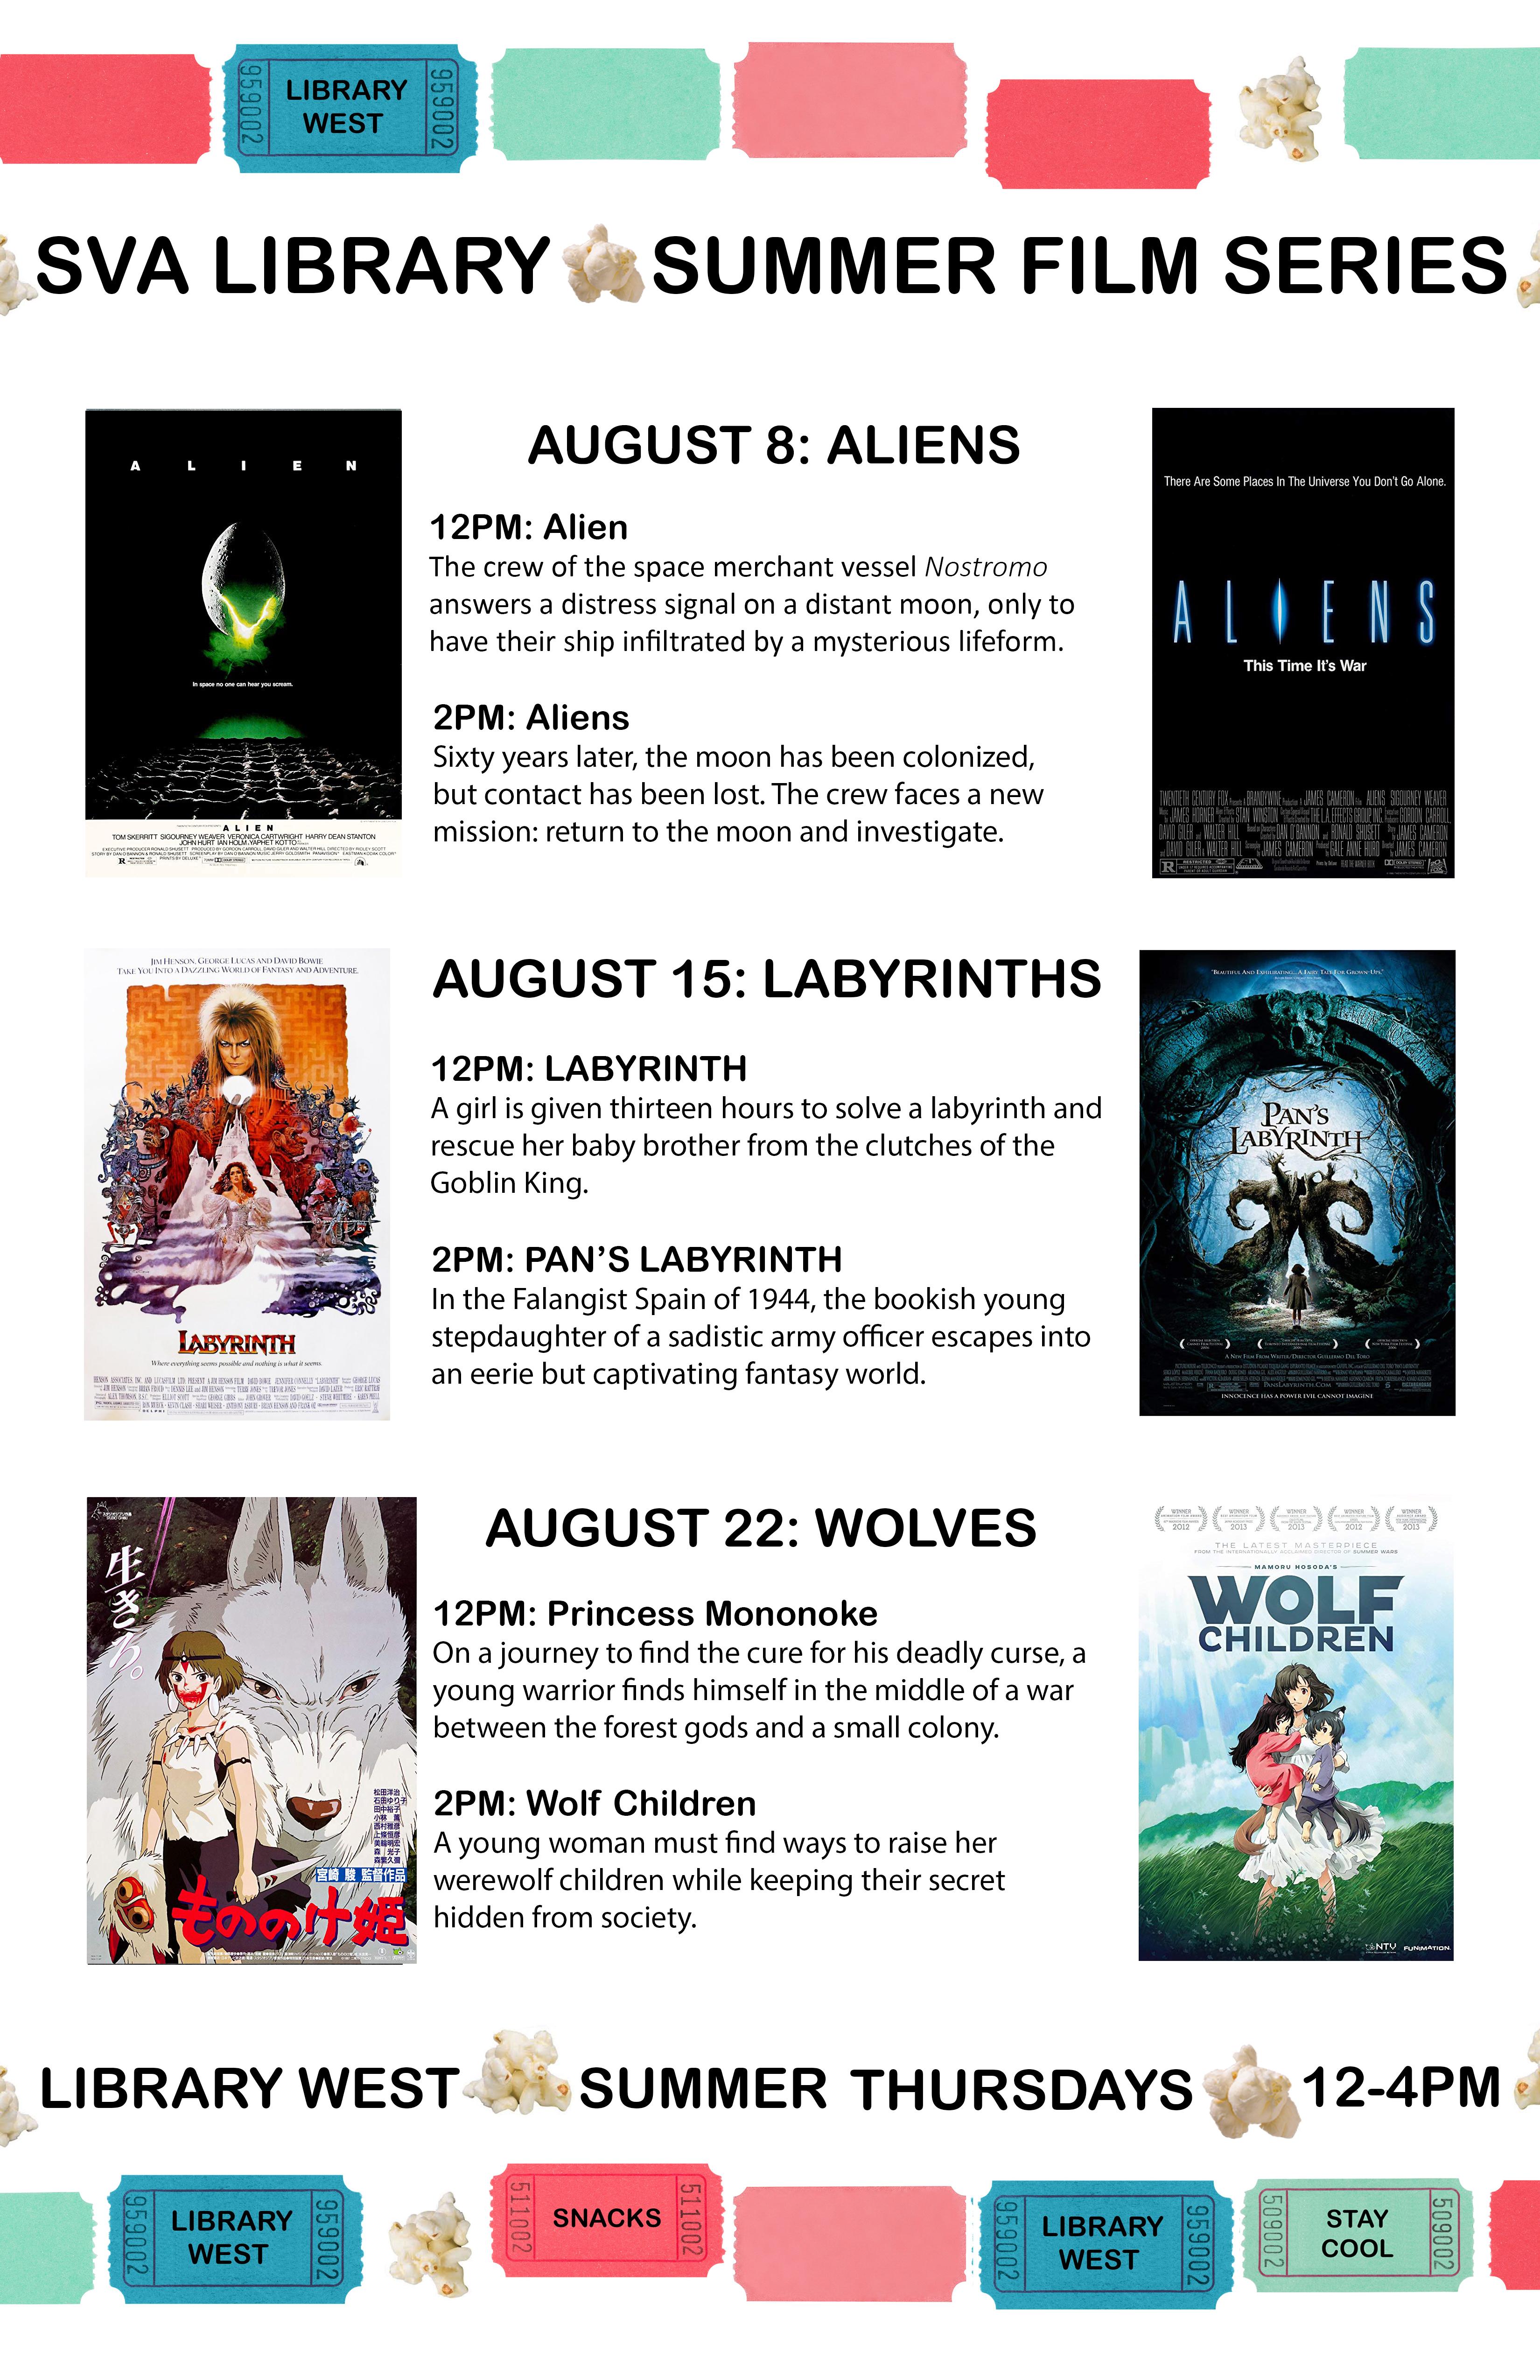 Film Screening: Labyrinth & Pan's Labyrinth